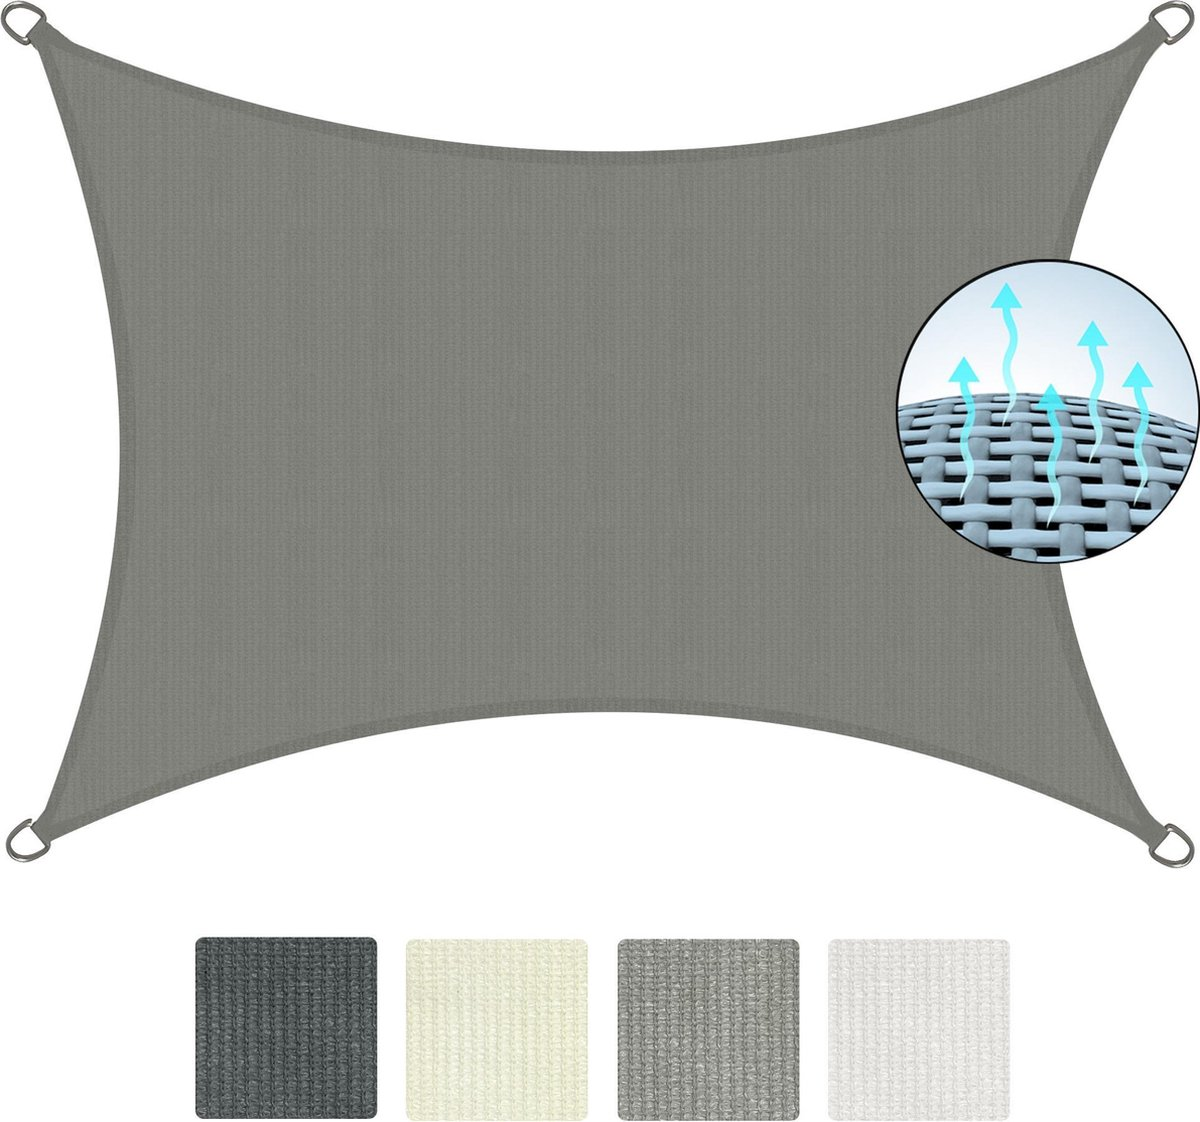 Sol Royal SolVision HS9 - Zonnezeil rechthoekig 300x400 cm HDPE Ademend - Grijs - Zonwering UV-besch